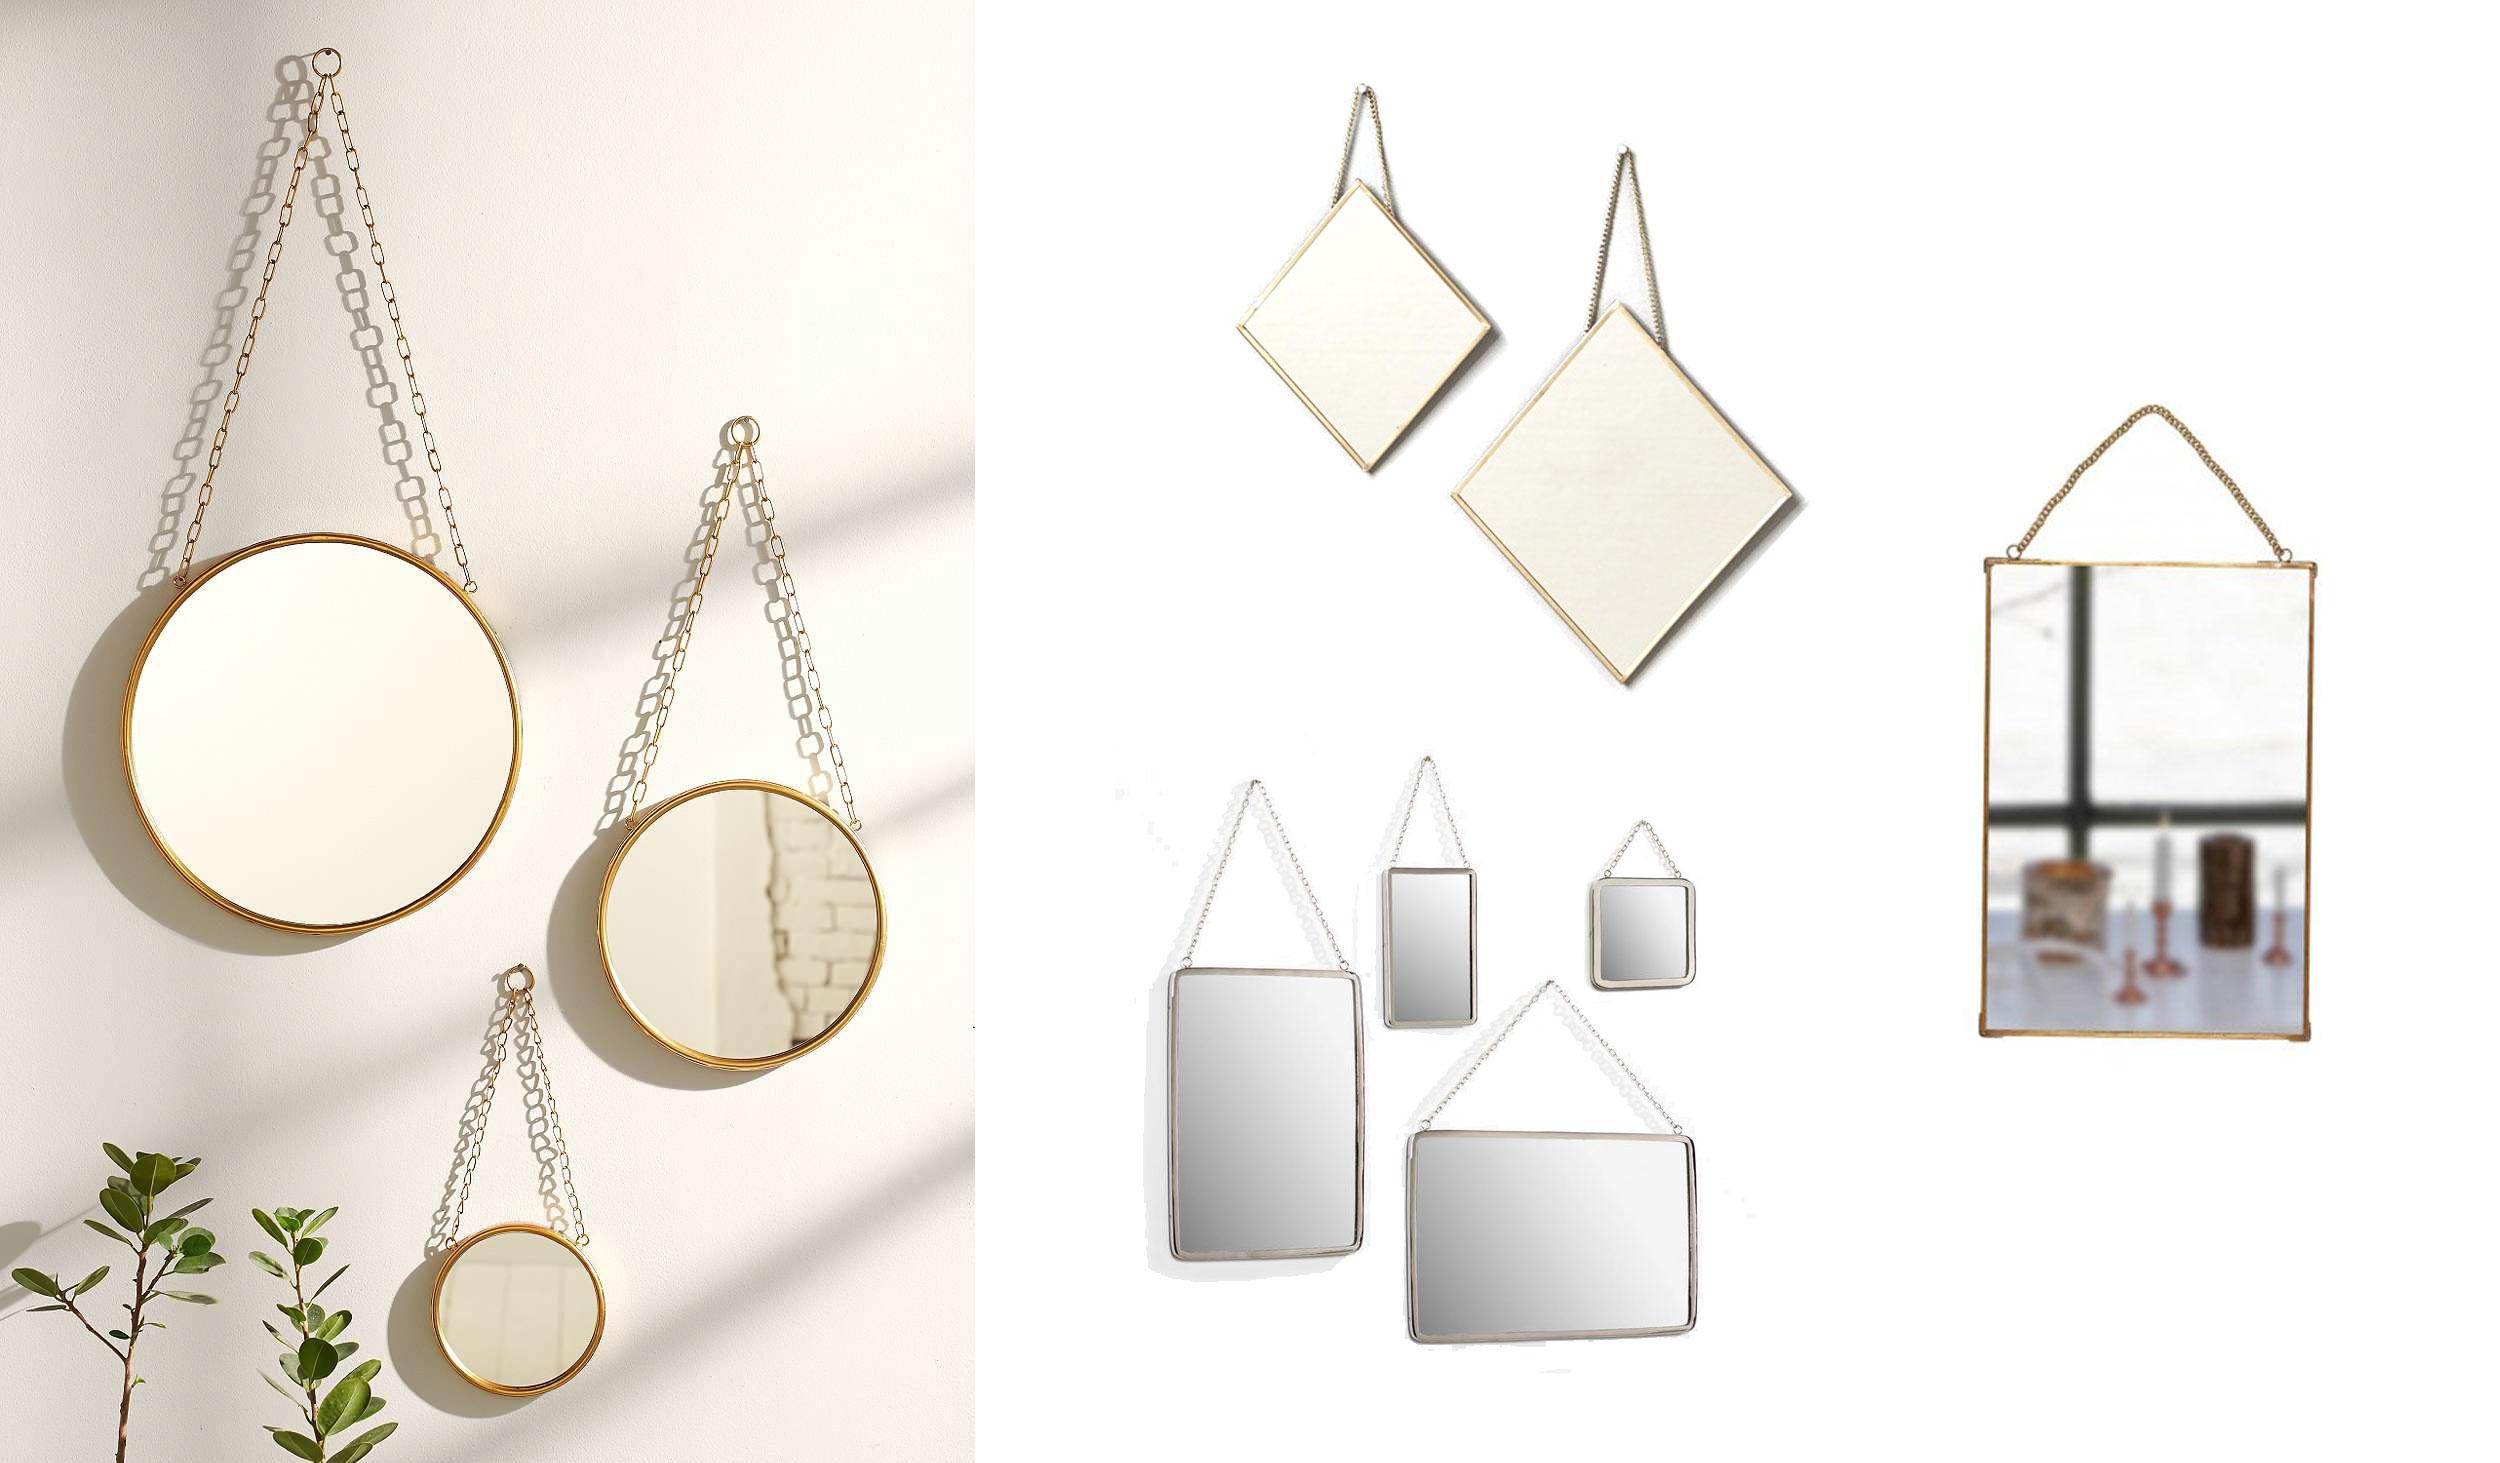 shopping miroirs barbier chaine doree cyrillus la redoute la seinographe. Black Bedroom Furniture Sets. Home Design Ideas